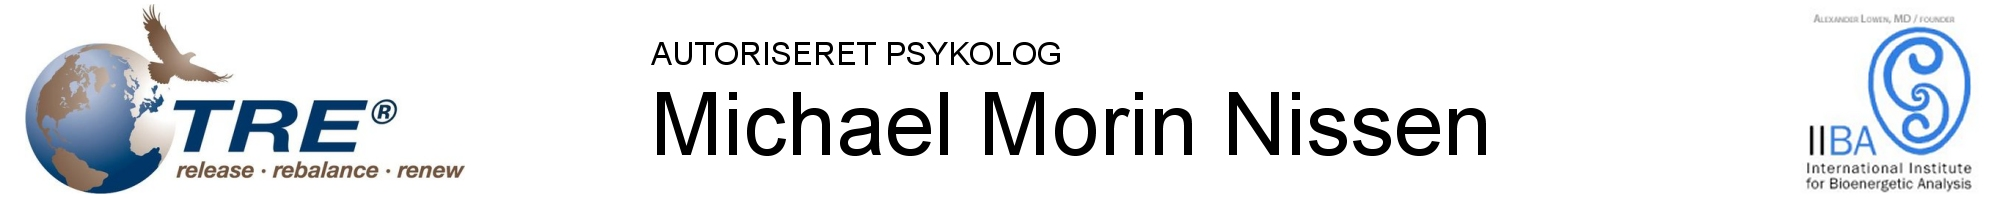 Michael Morin Nissen | TRE | Bioenergetik Logo